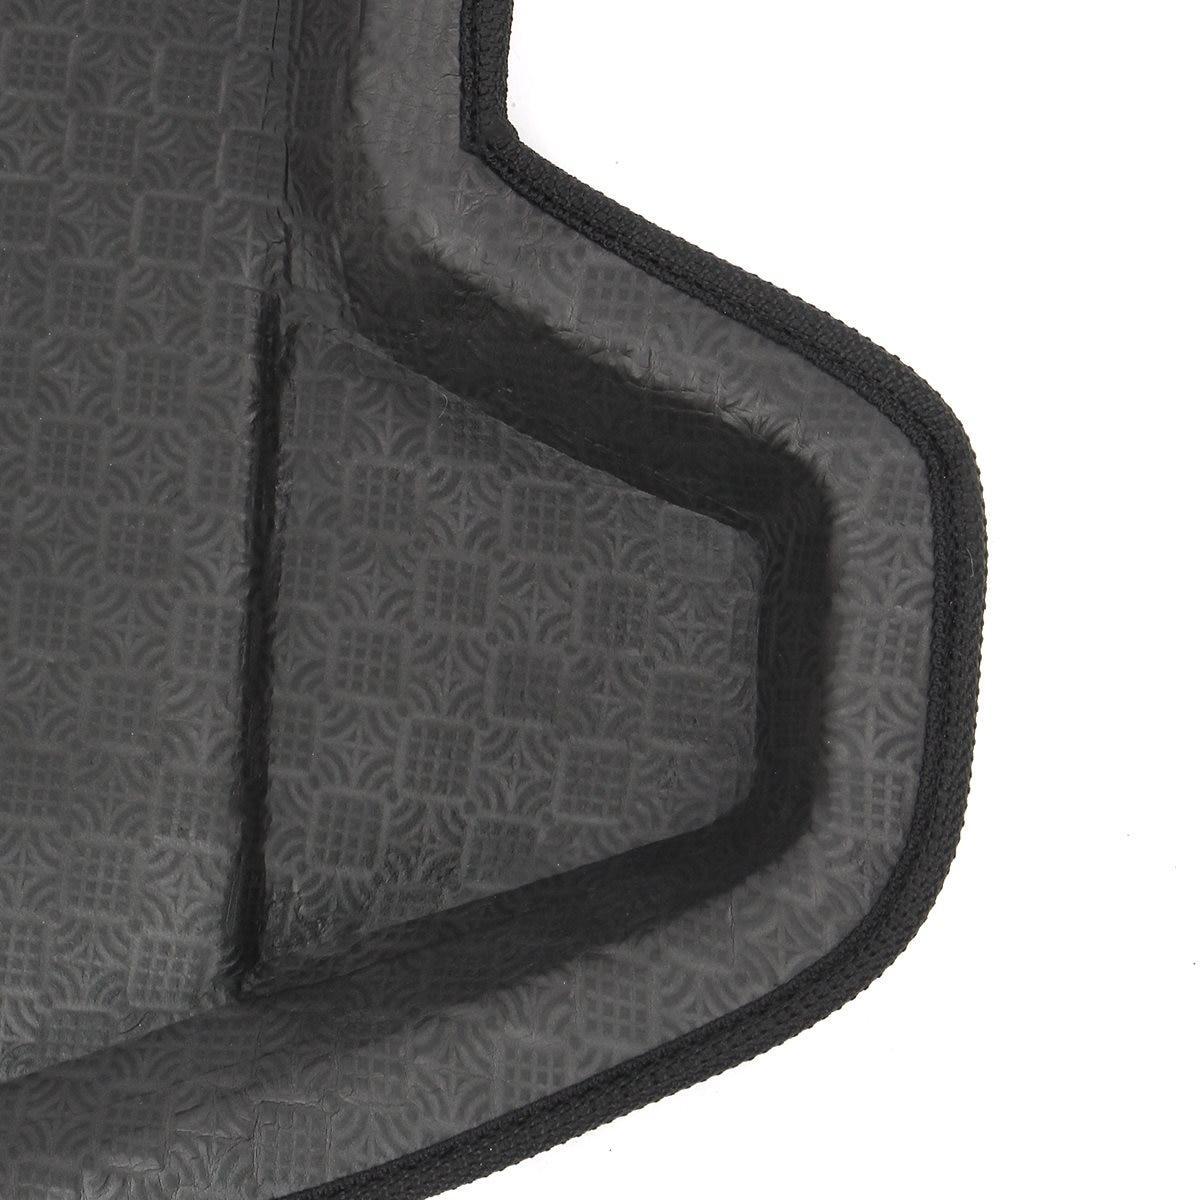 Ford Escape Kuga 2013 2017 Boot Comport Carpet Karpet Mercy Cla200 2 Pintu Premium 2cm Aliexpress